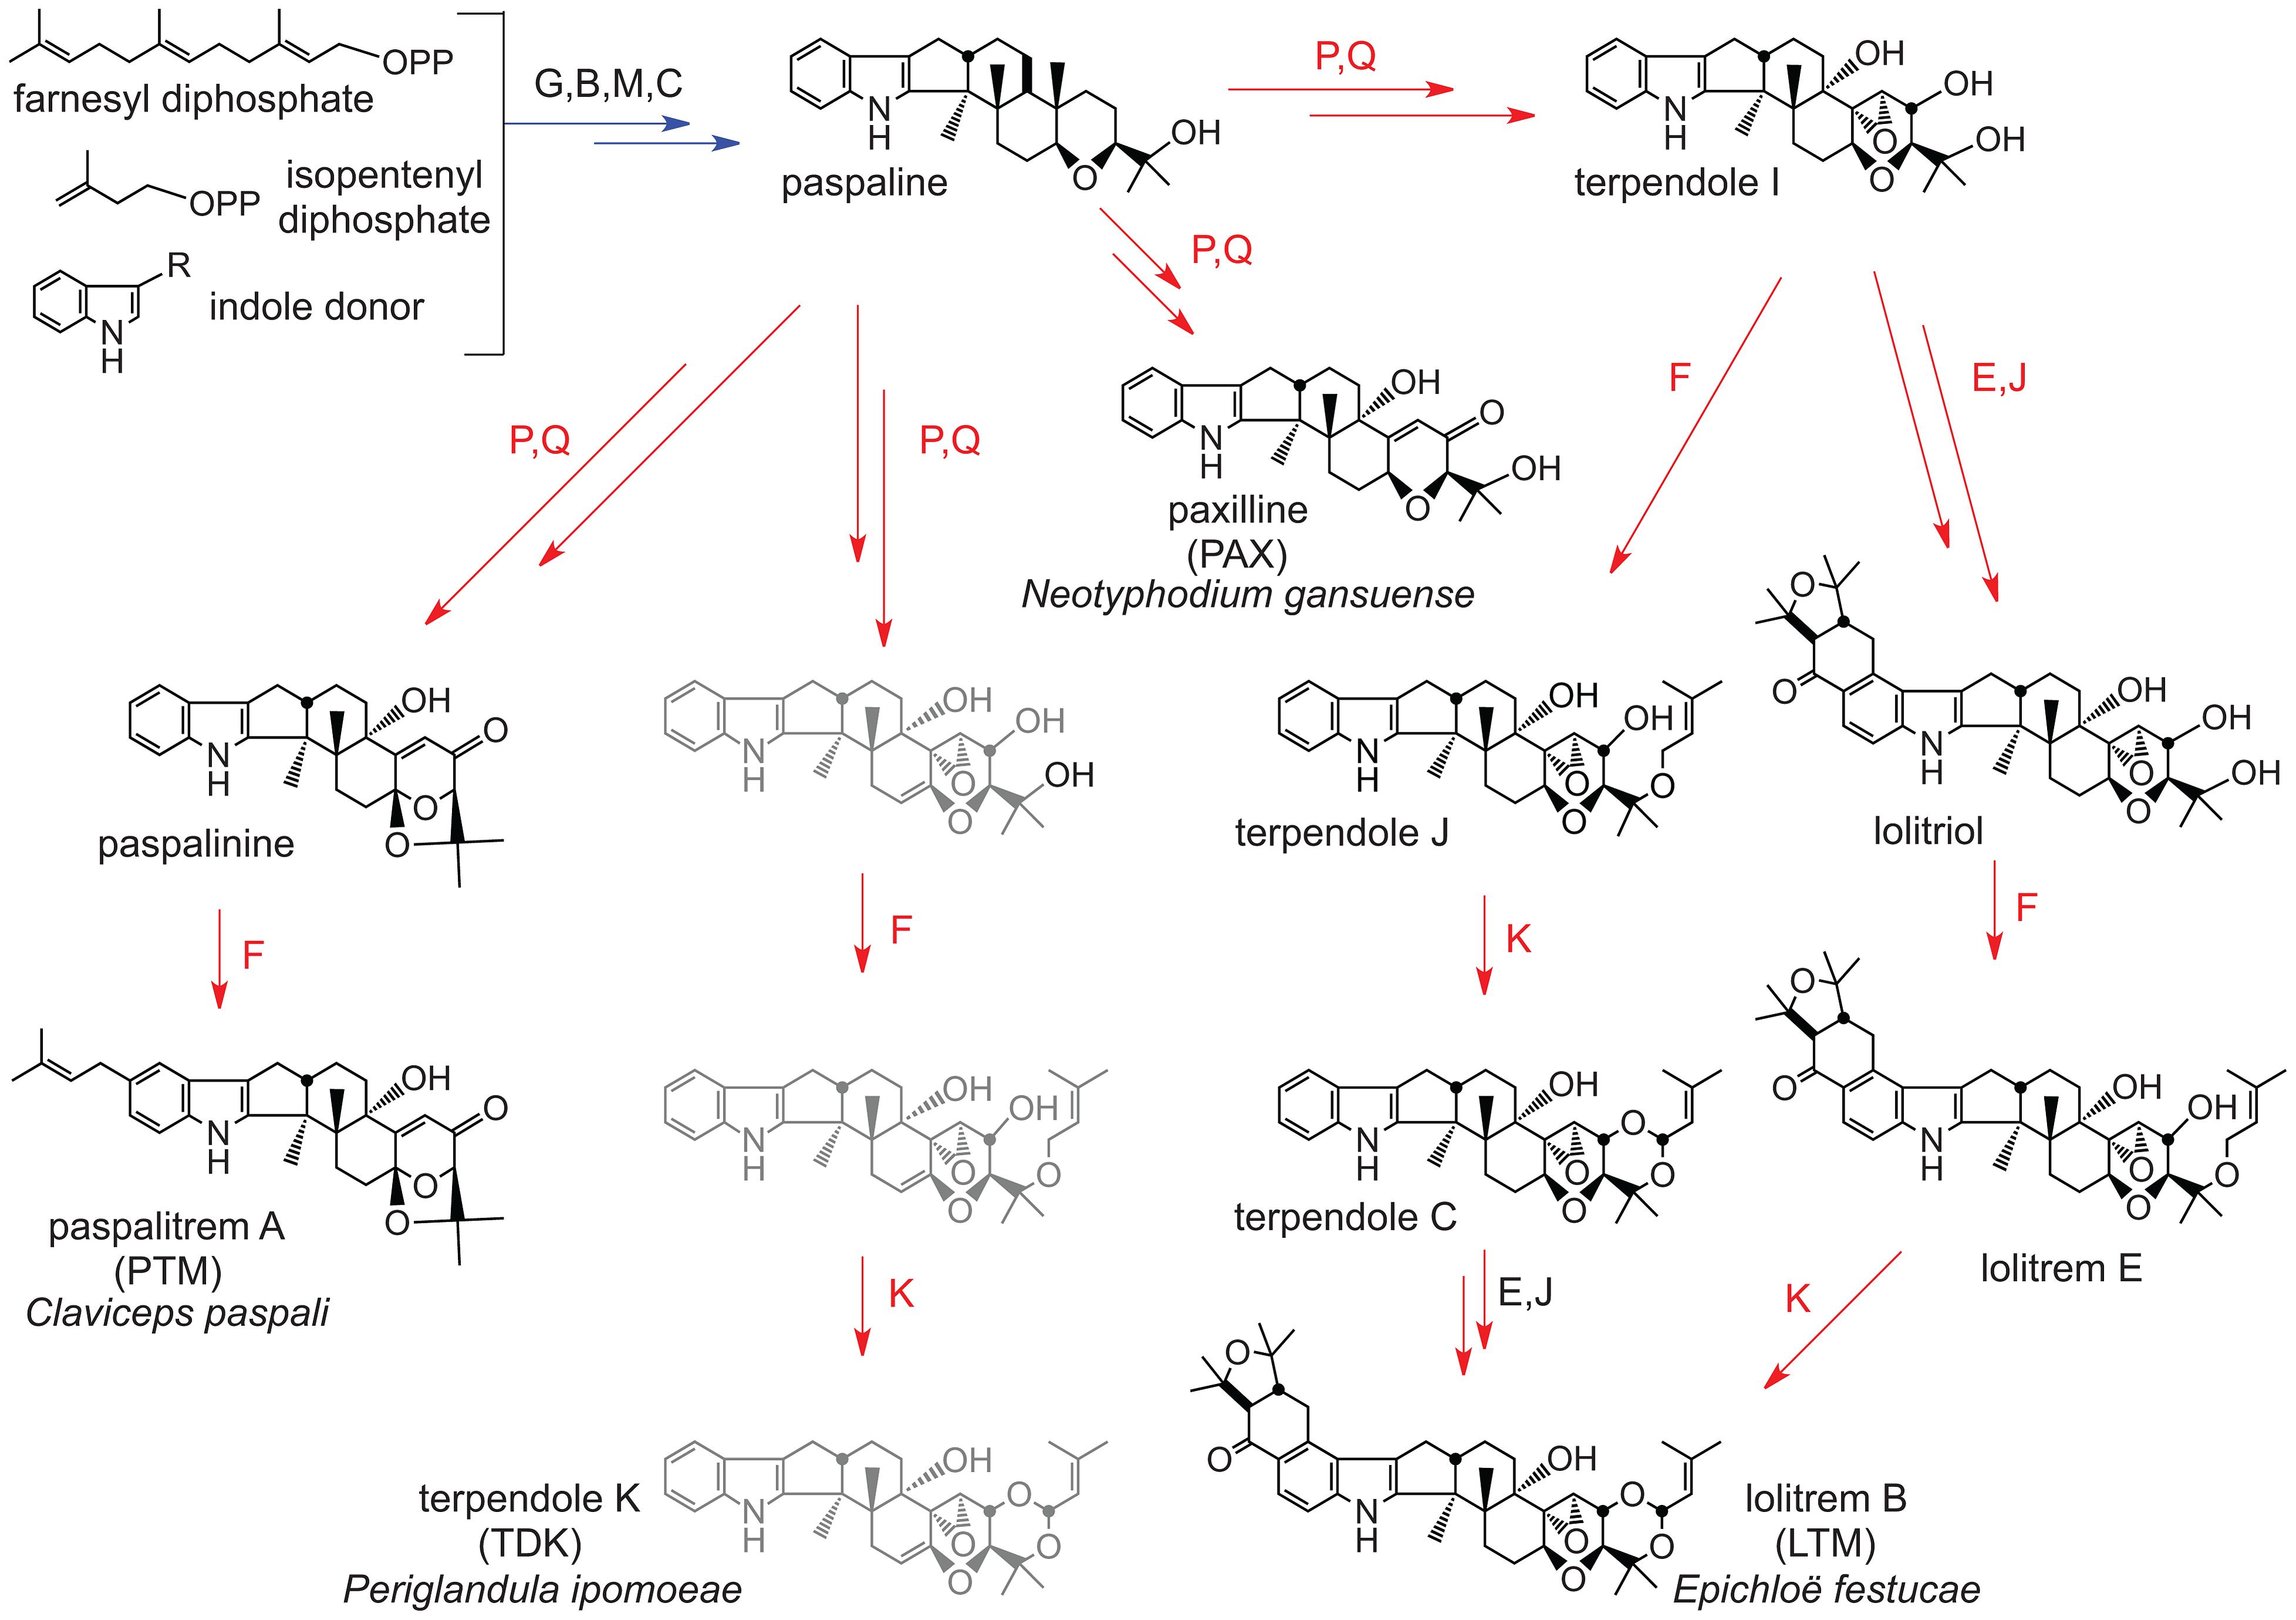 Summary of indole-diterpene biosynthesis pathway.